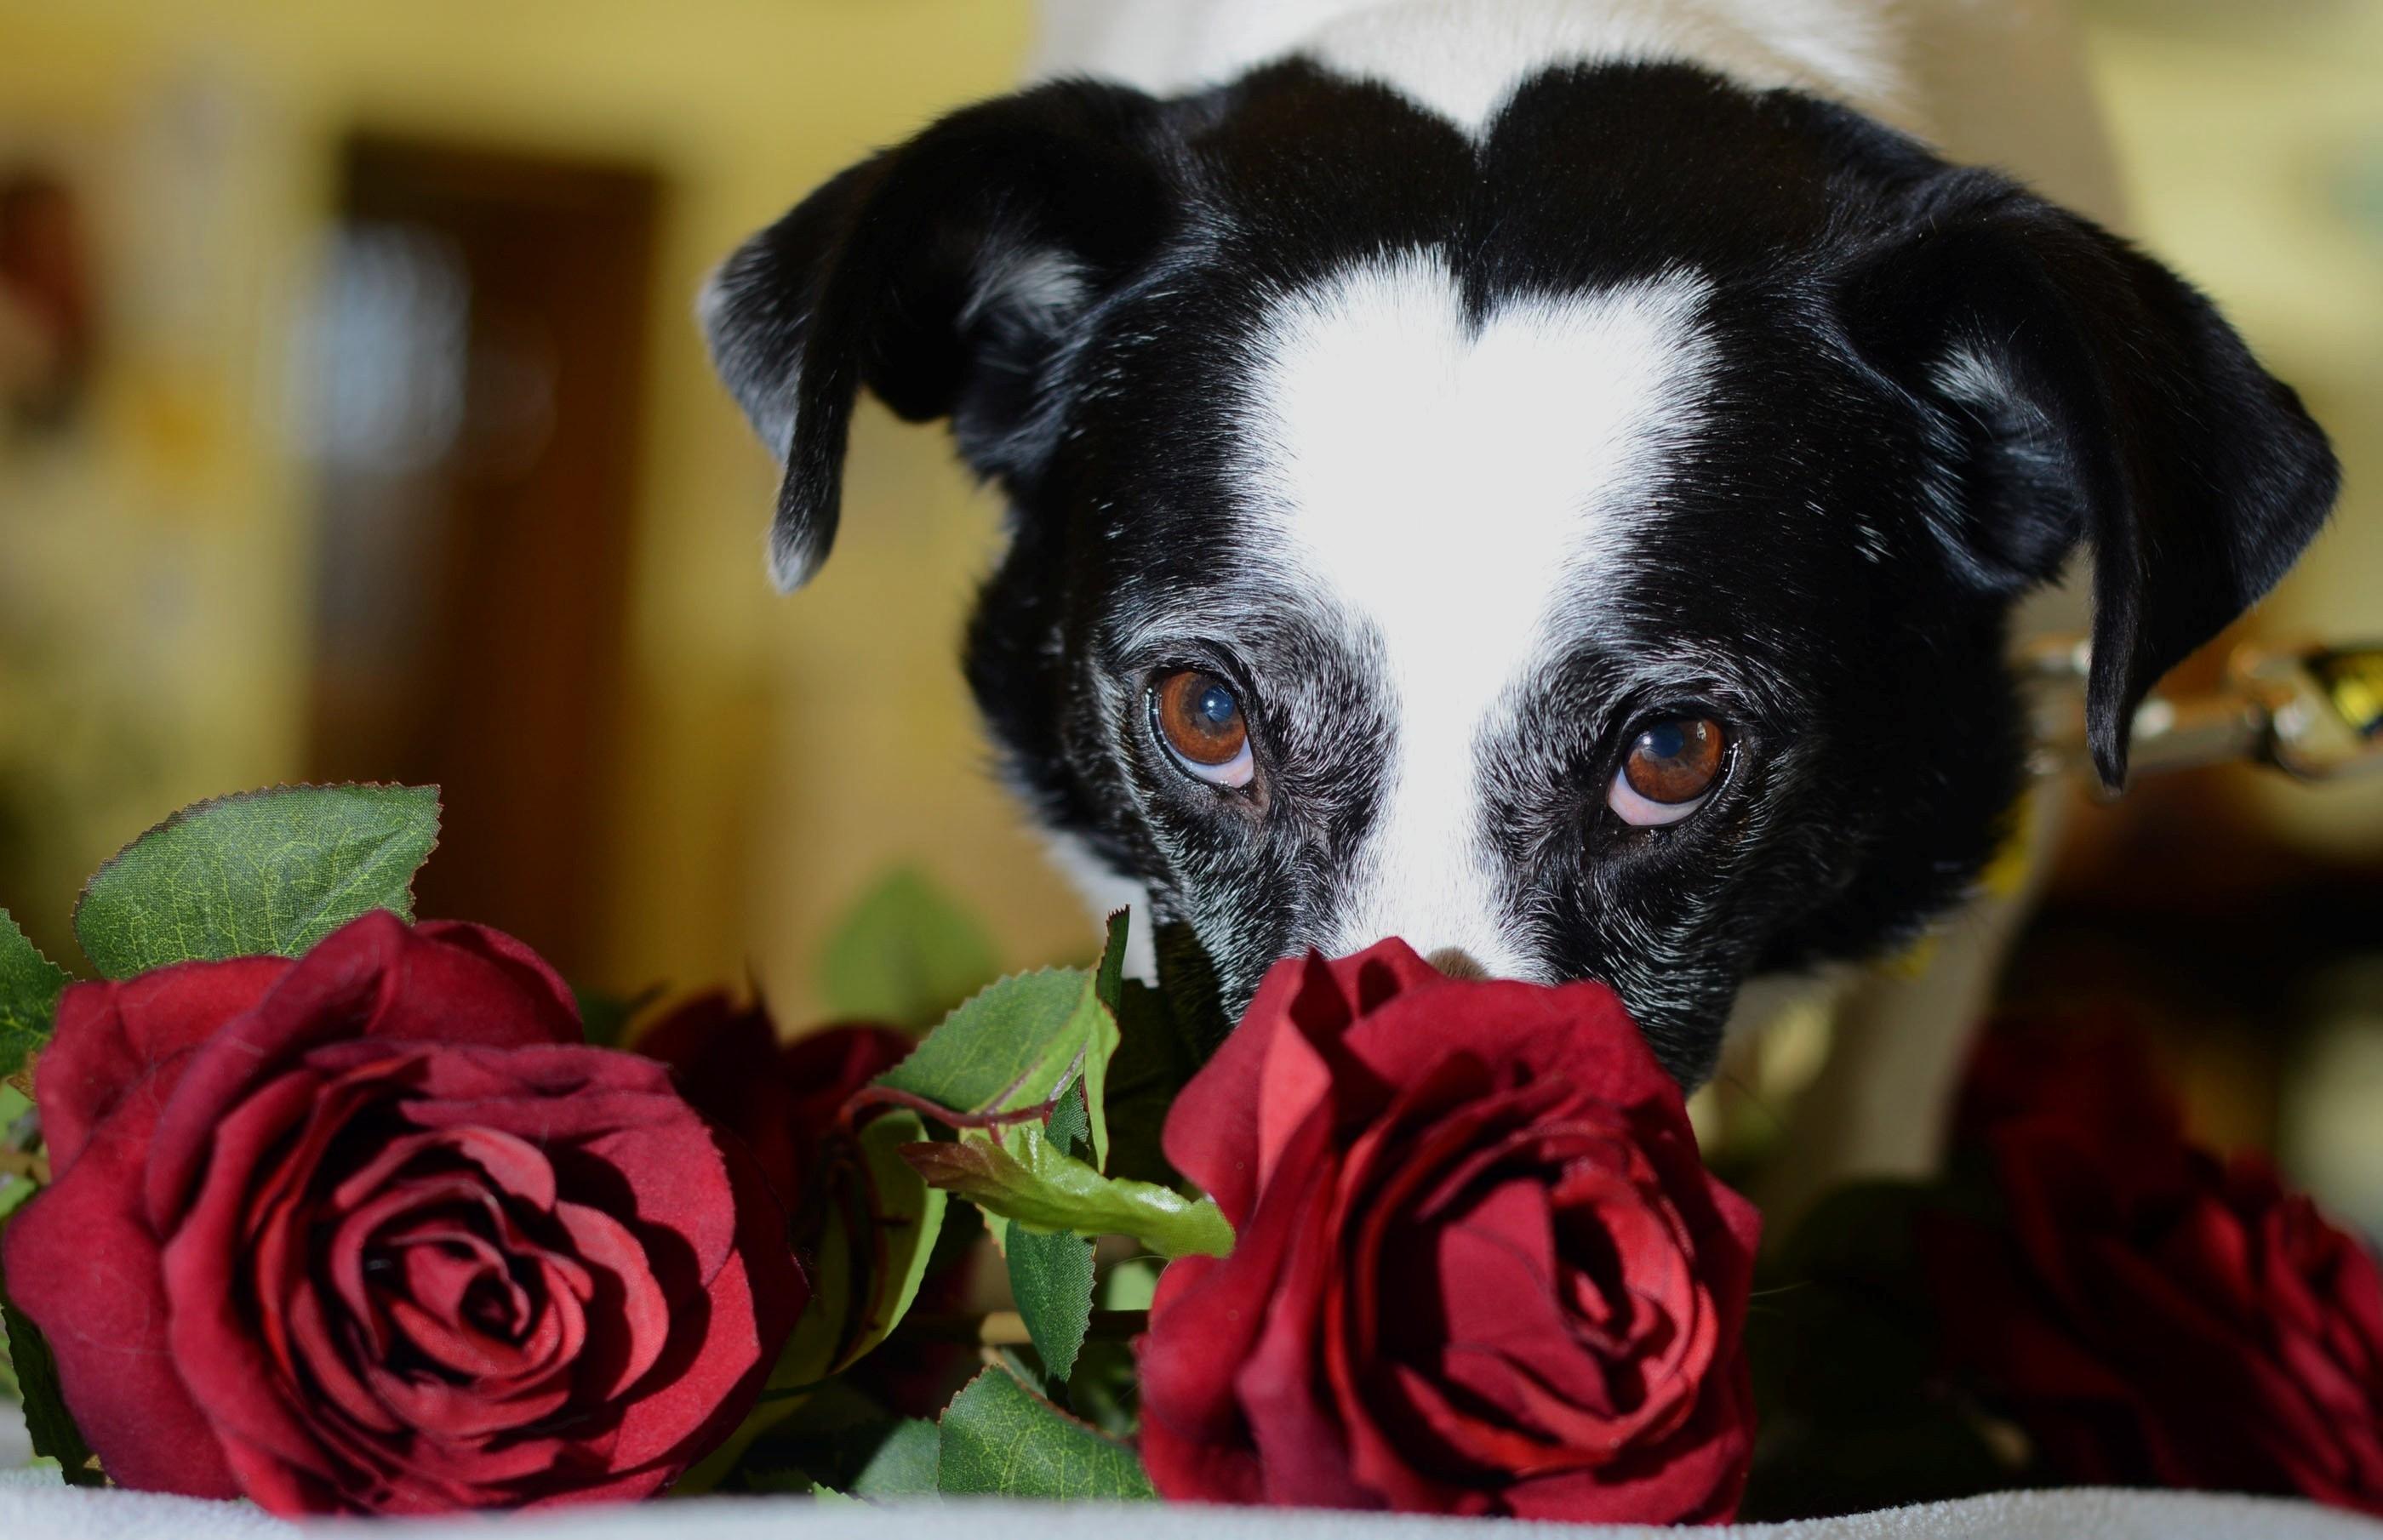 Dodger just wants love